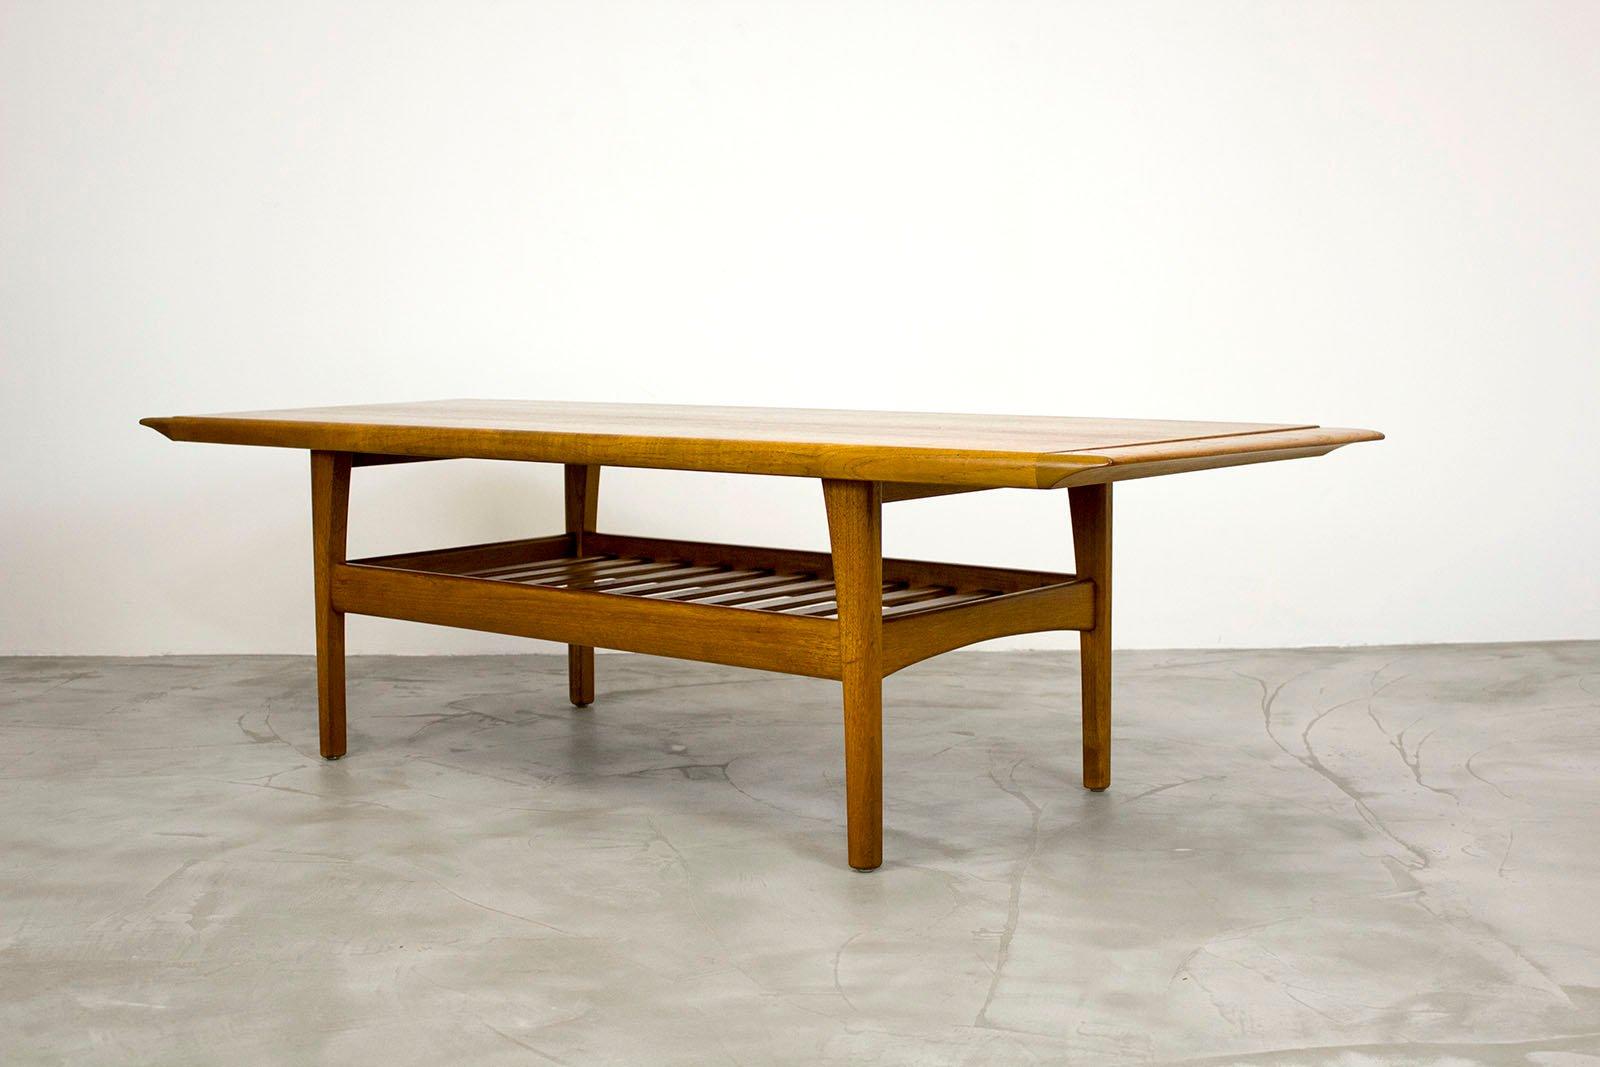 teak coffee table. Danish Teak Coffee Table With Magazine Shelf, 1960s K